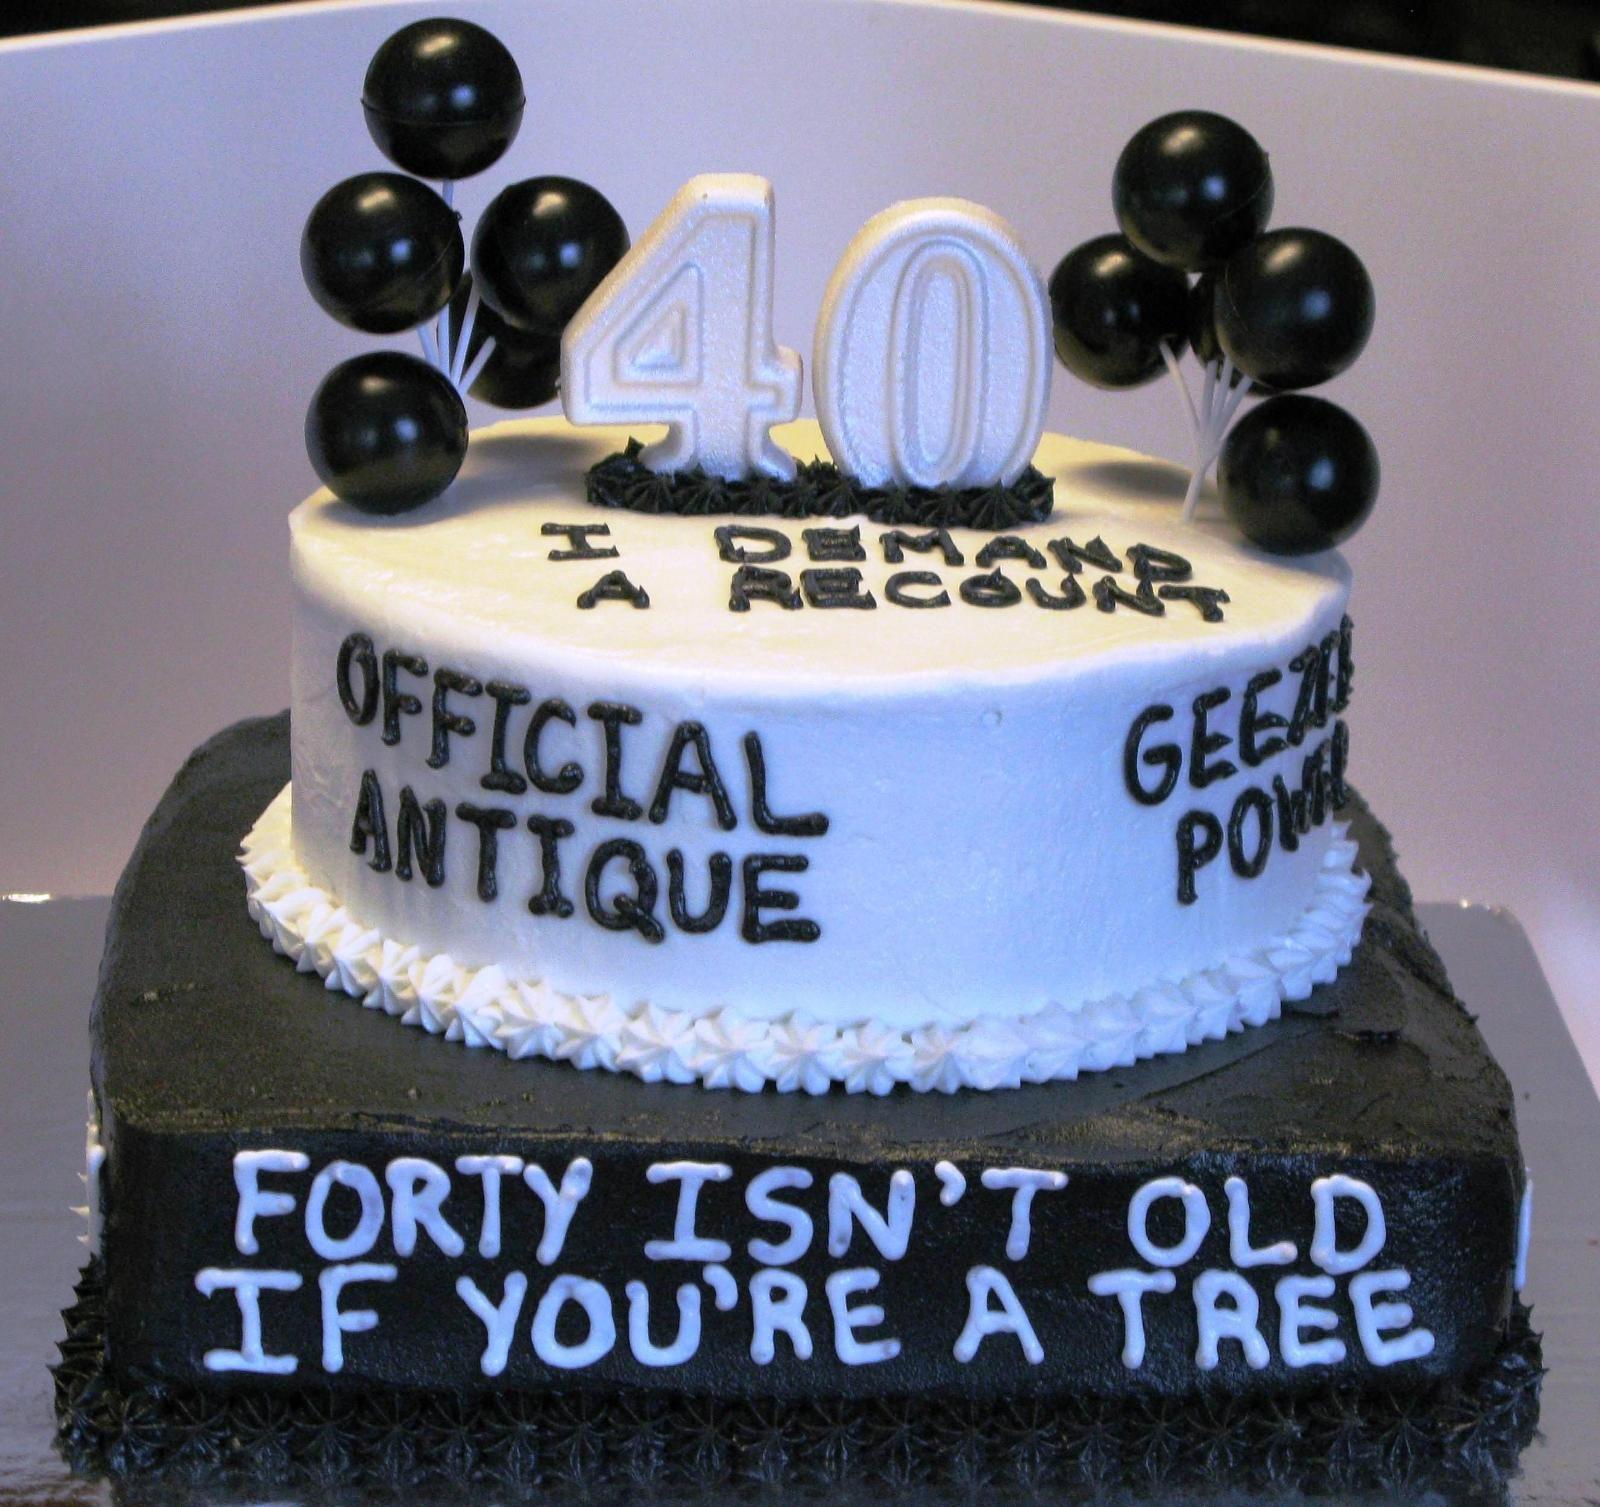 40th Birthday Cake Ideas Funny 40th Birthday Cake Ideas and